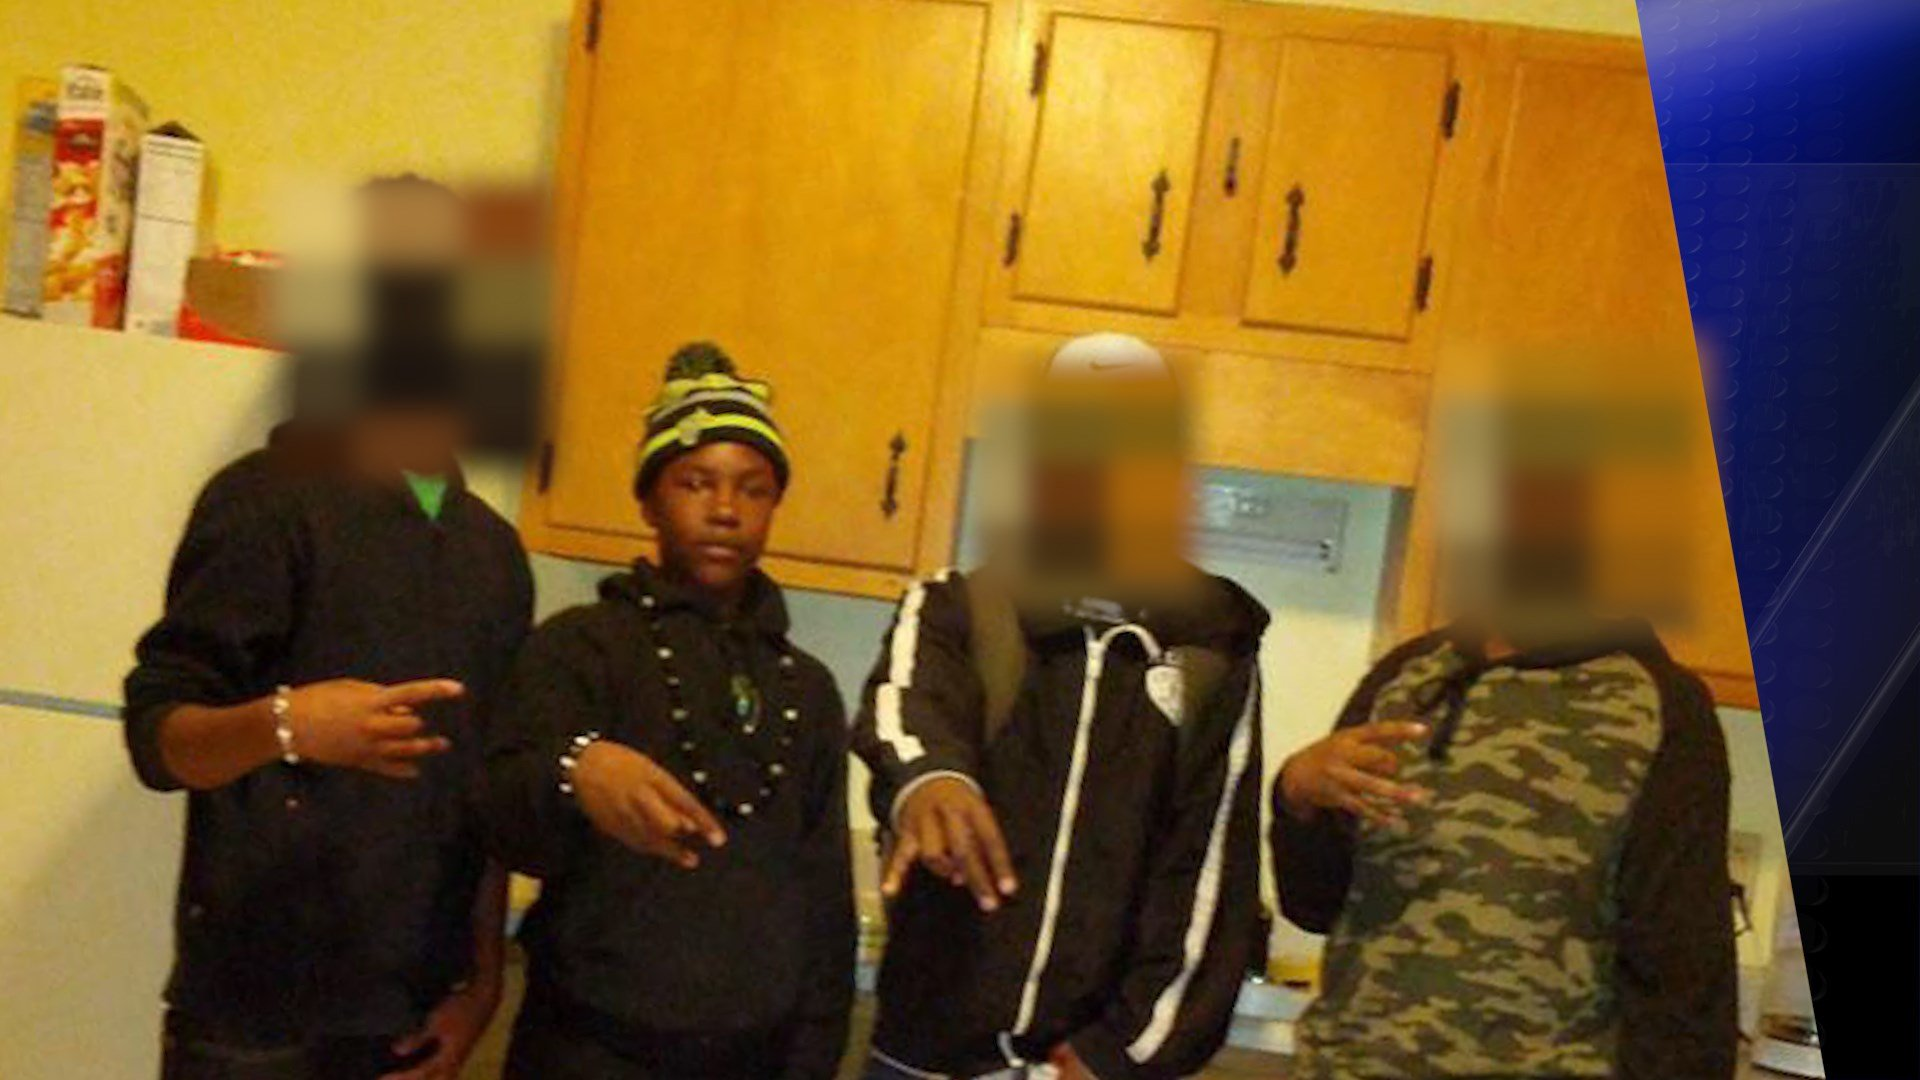 Erie pa gangs